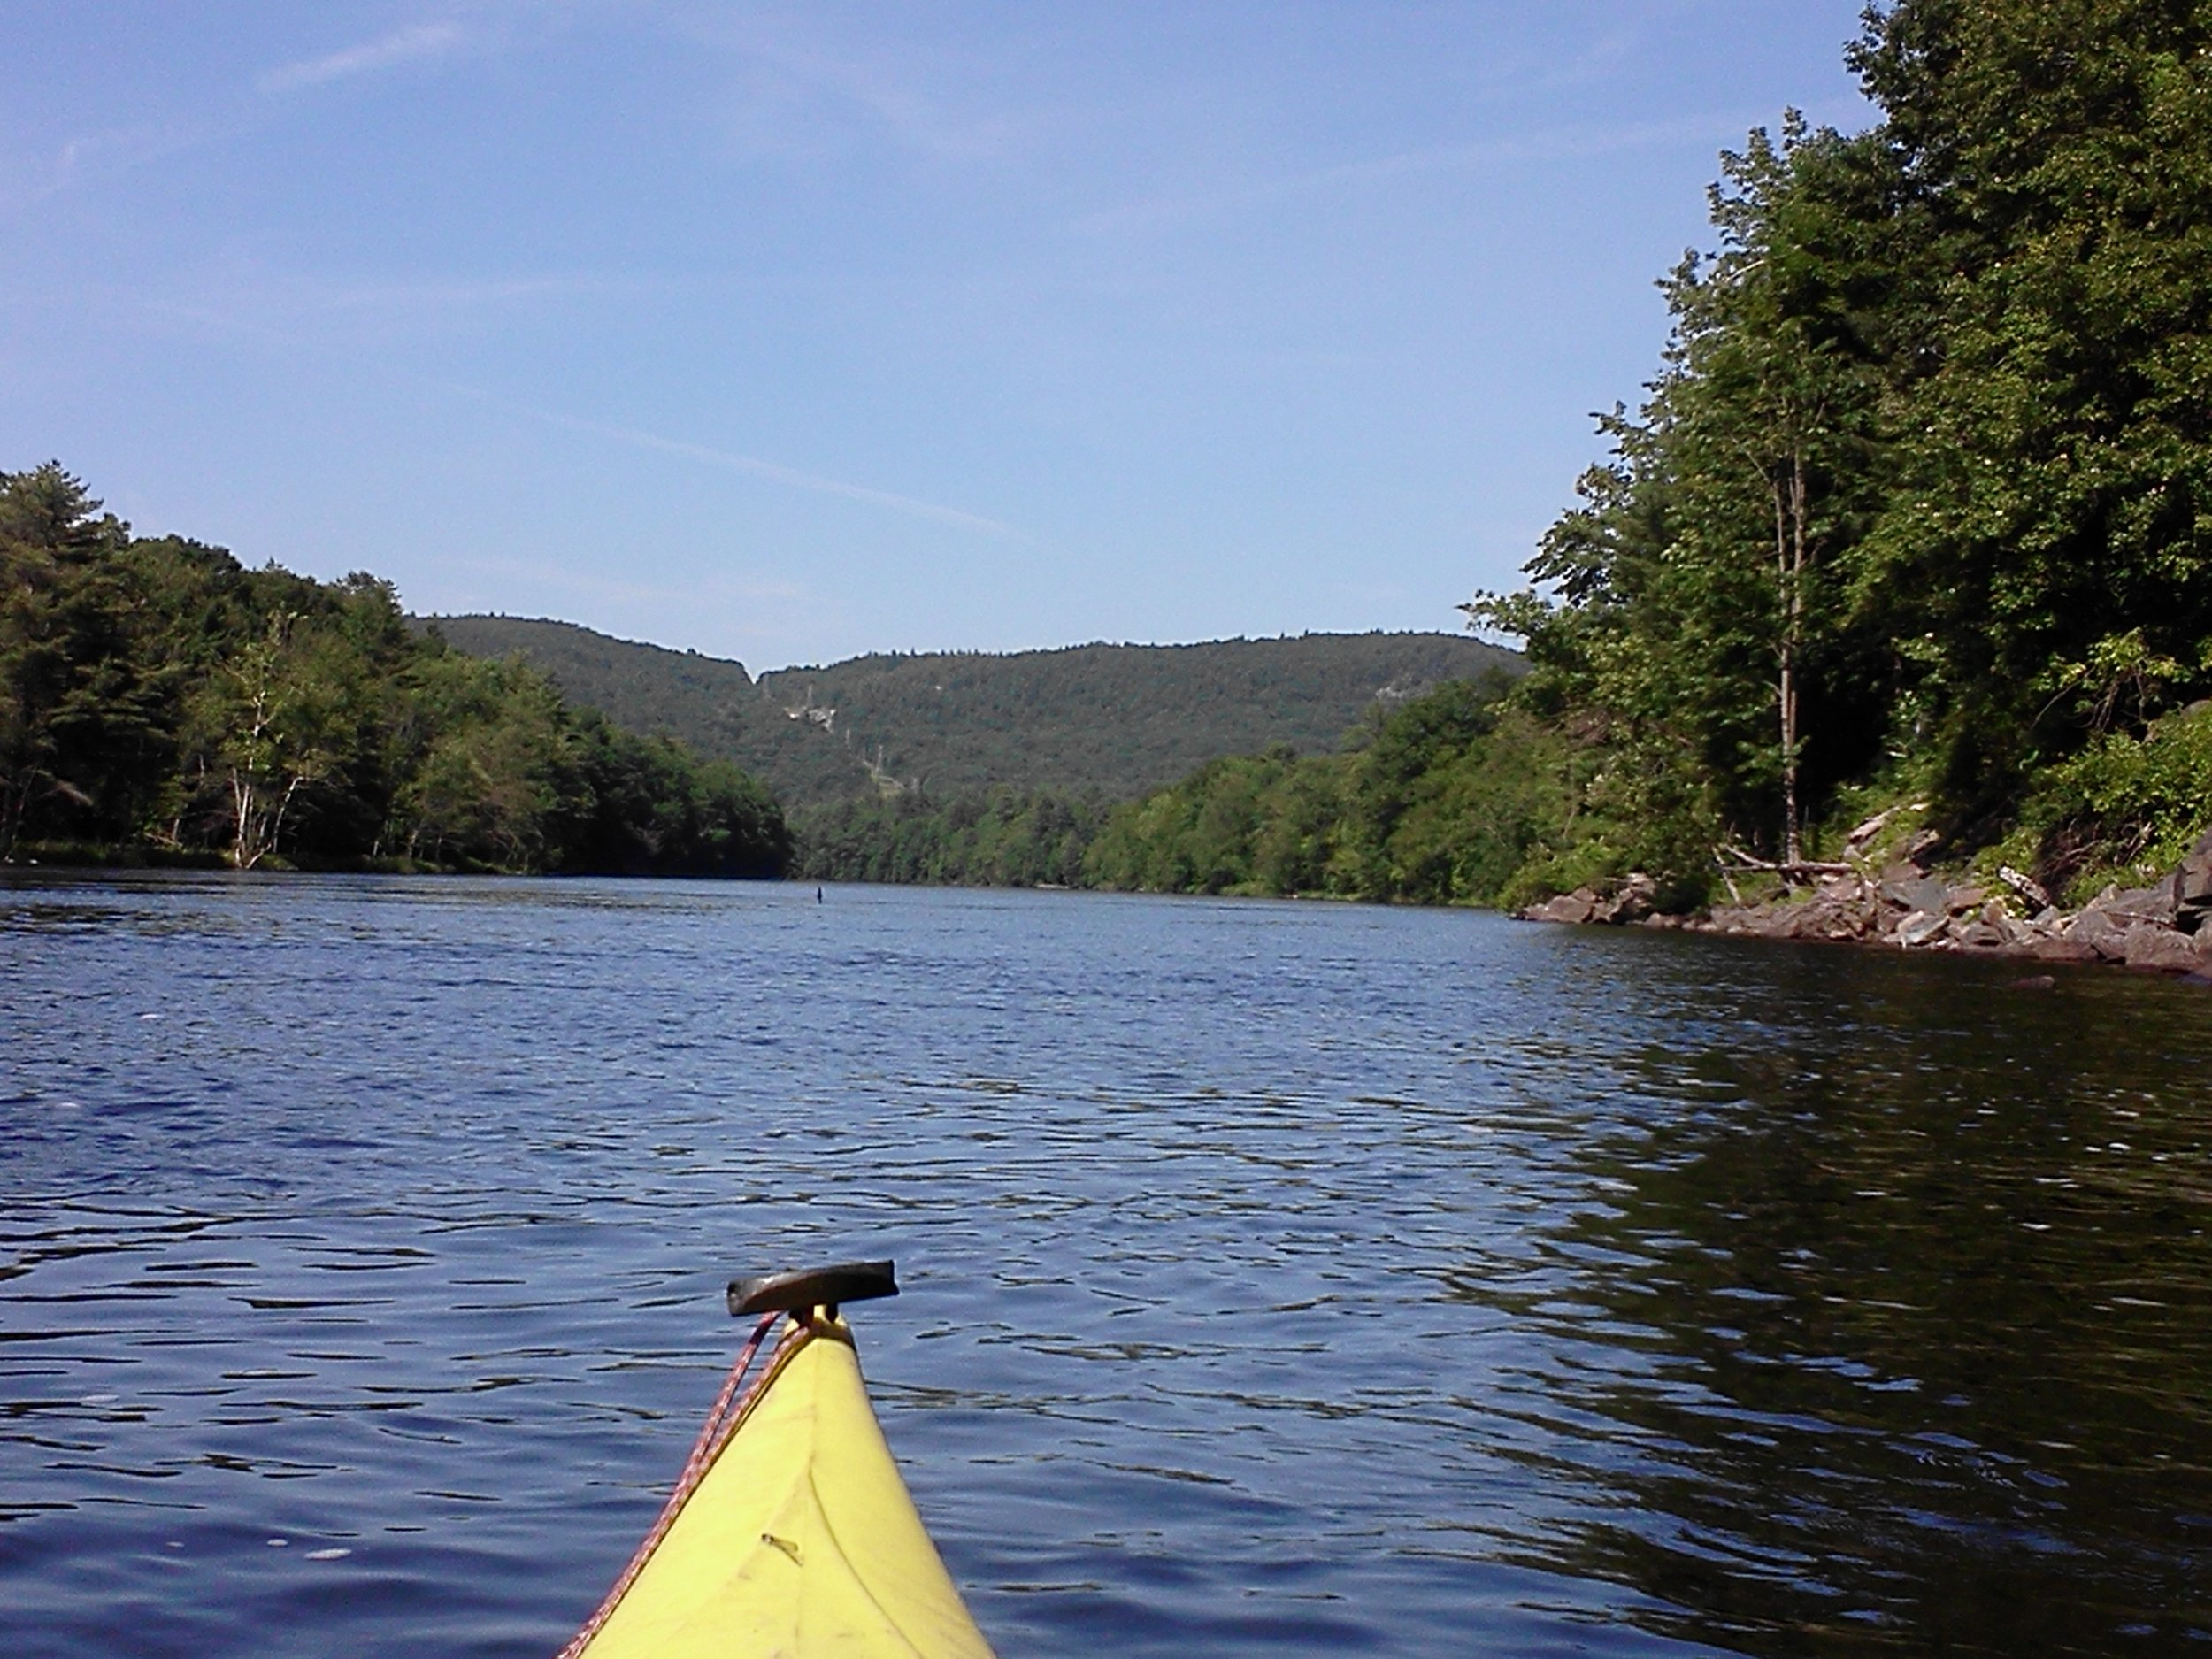 Kayaking on the Hudson River near Moreau, NY.  Land of hiking, biking and kayaking around this area.